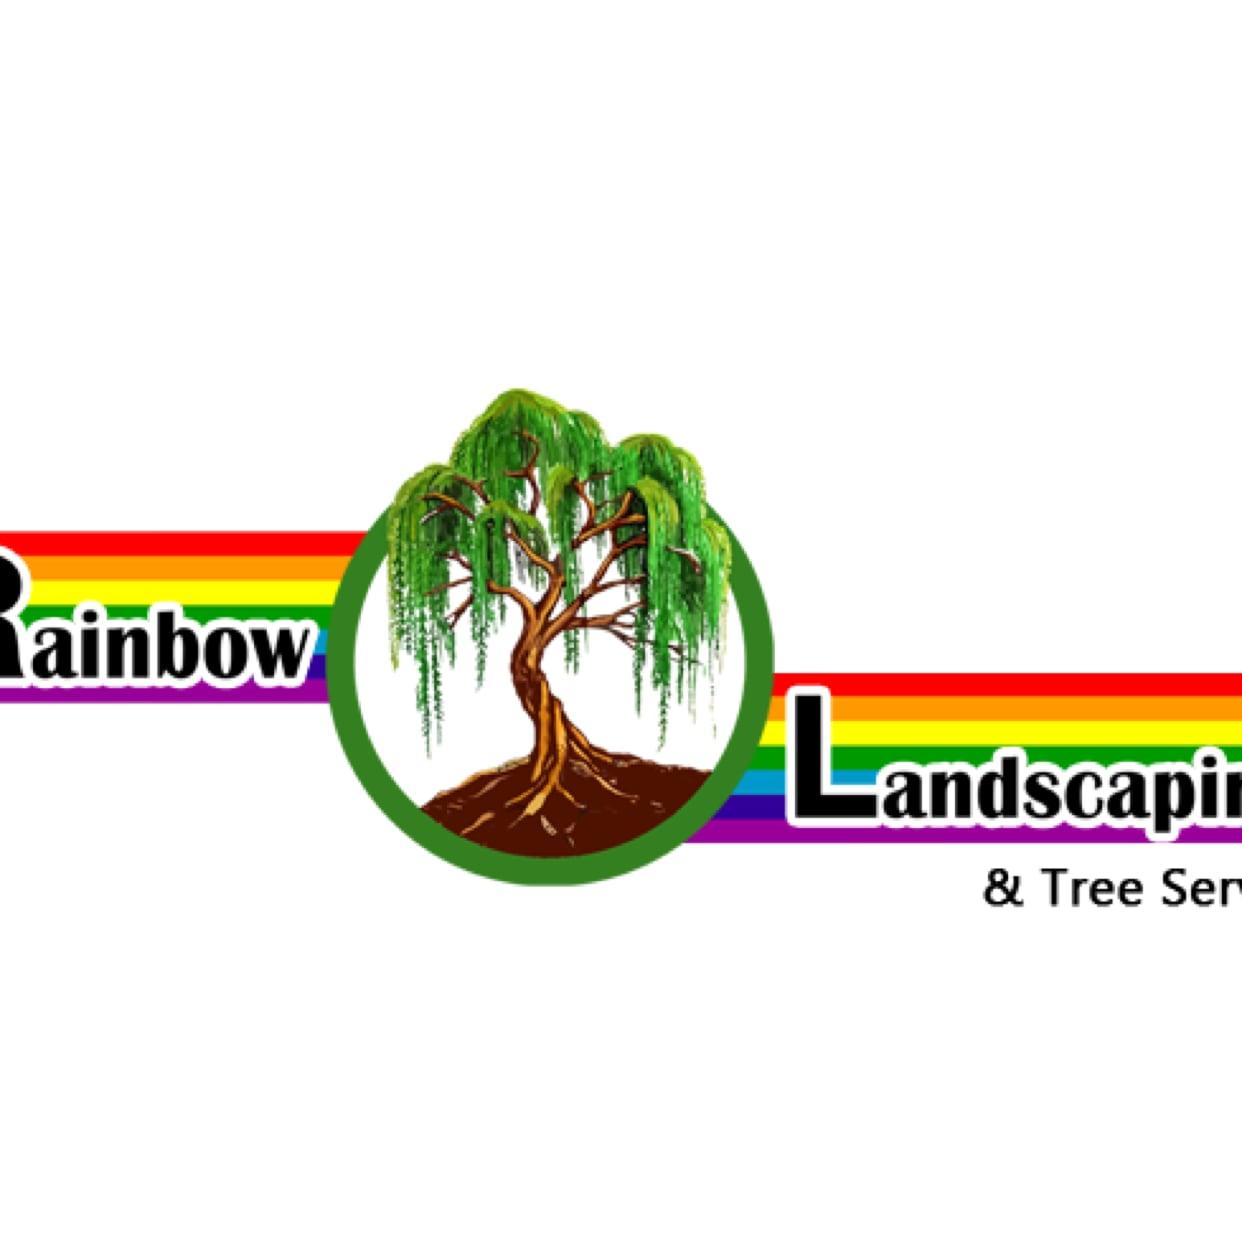 Rainbow Landscaping